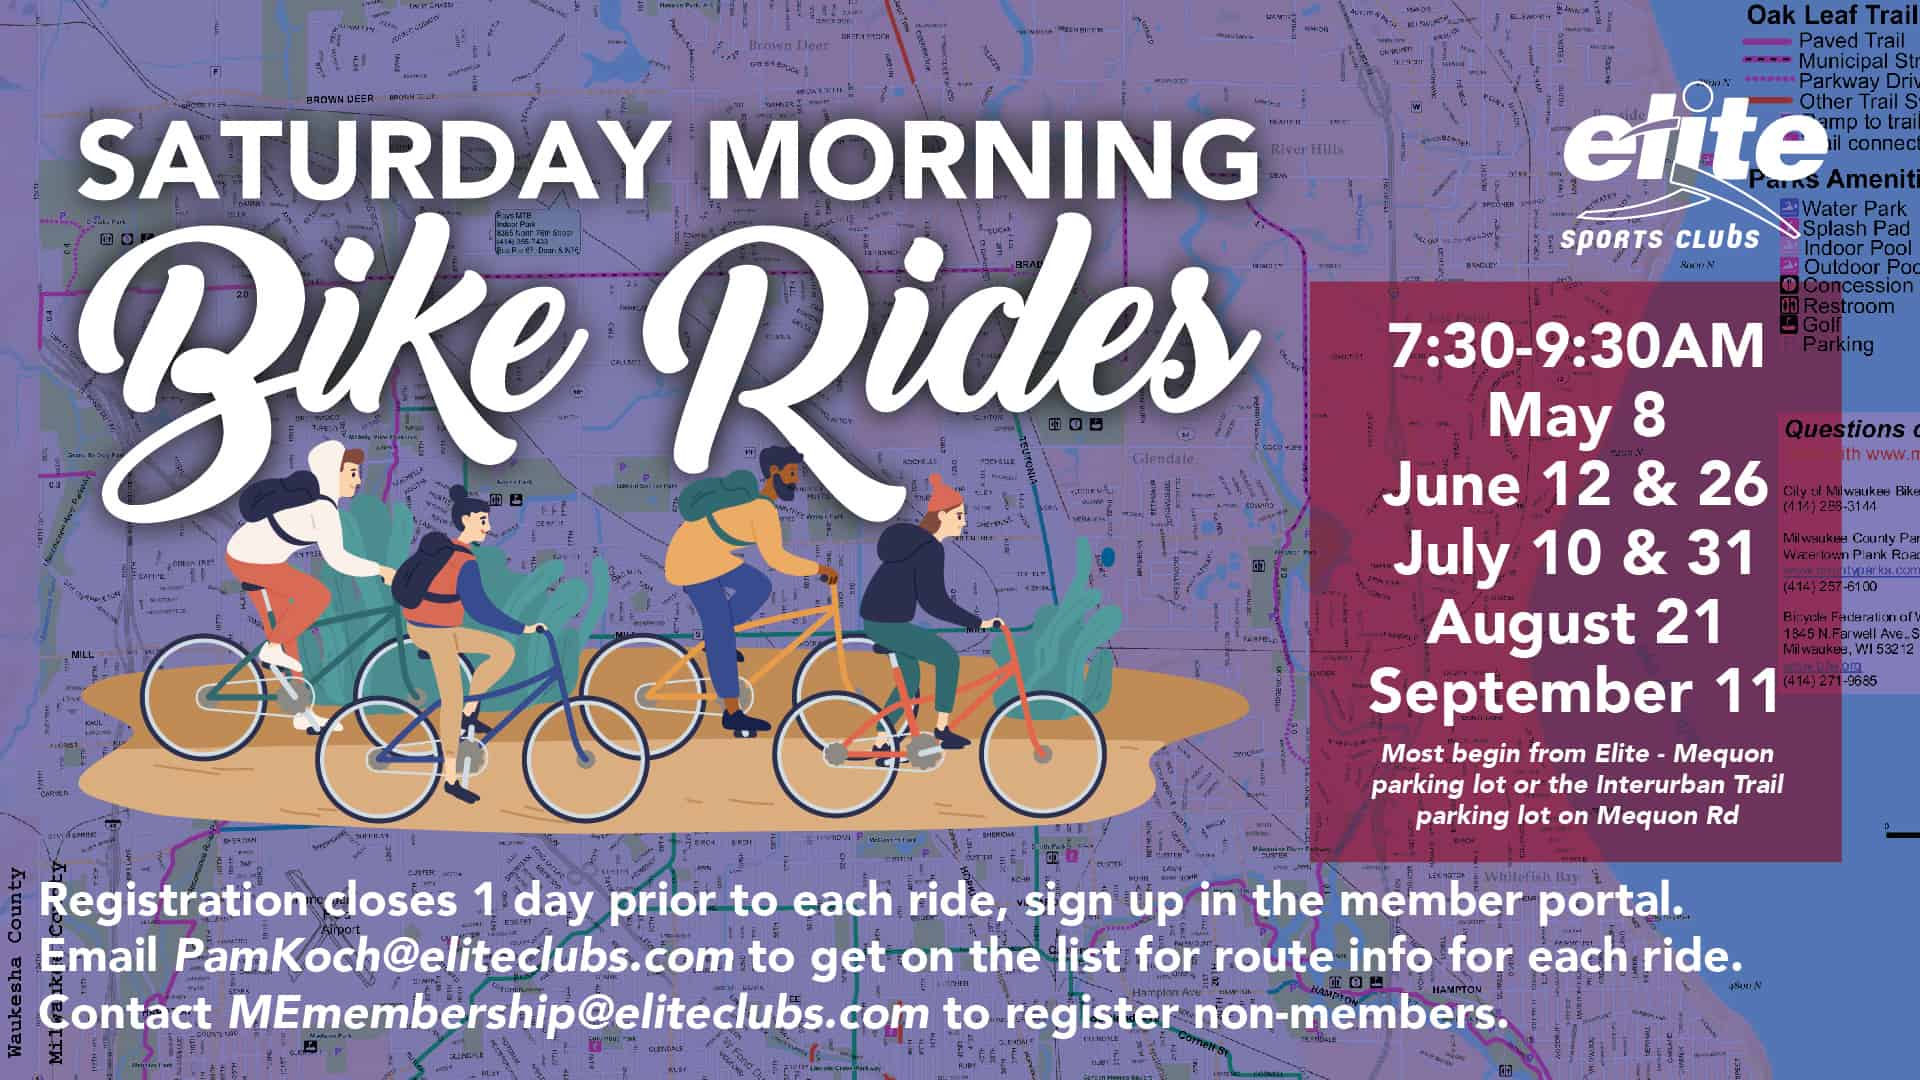 Saturday Morning Bike Rides - Elite Mequon - Summer 2021